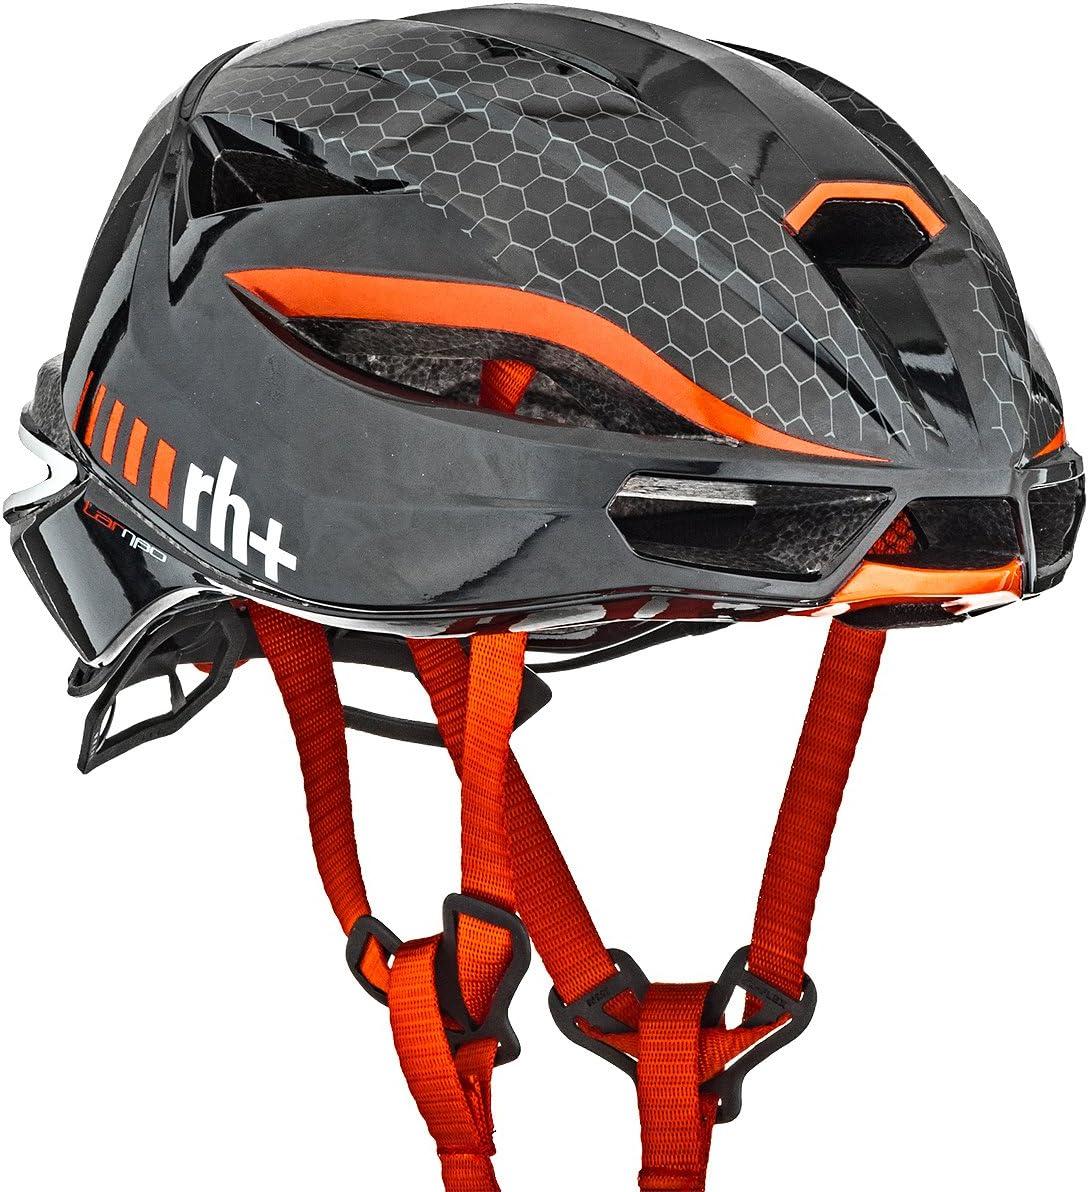 rh+(アールエイチプラス) ヘルメット ランボ [LAMBO] JCF公認 EHX6077 シャイニーブラック/シャイニーレッド XS/M